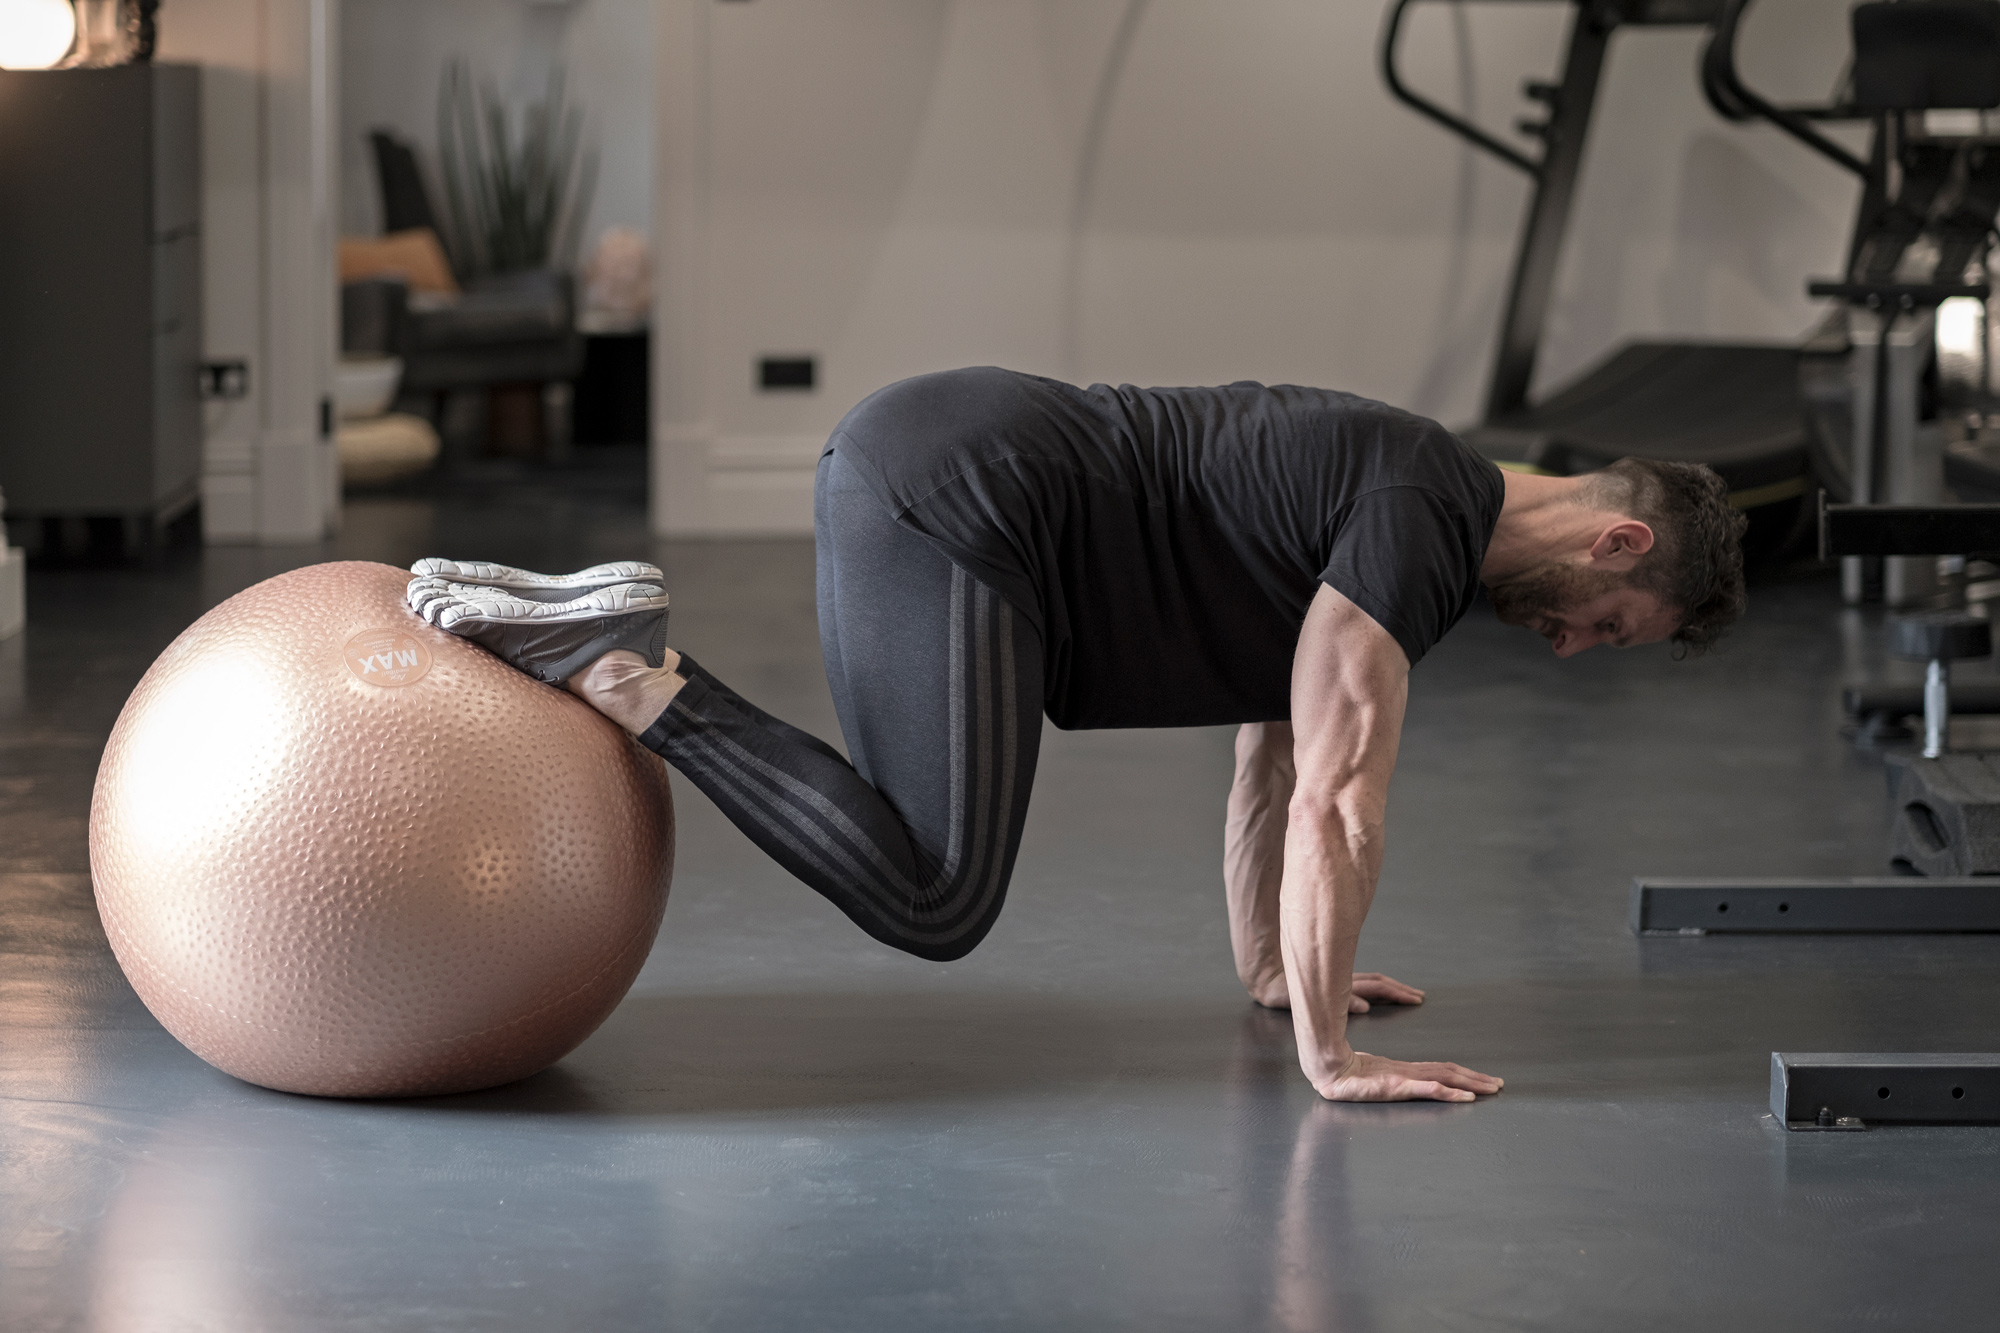 Fiona-Burrage-Ball-Gym-Paradox-Norwich-Photography.jpg